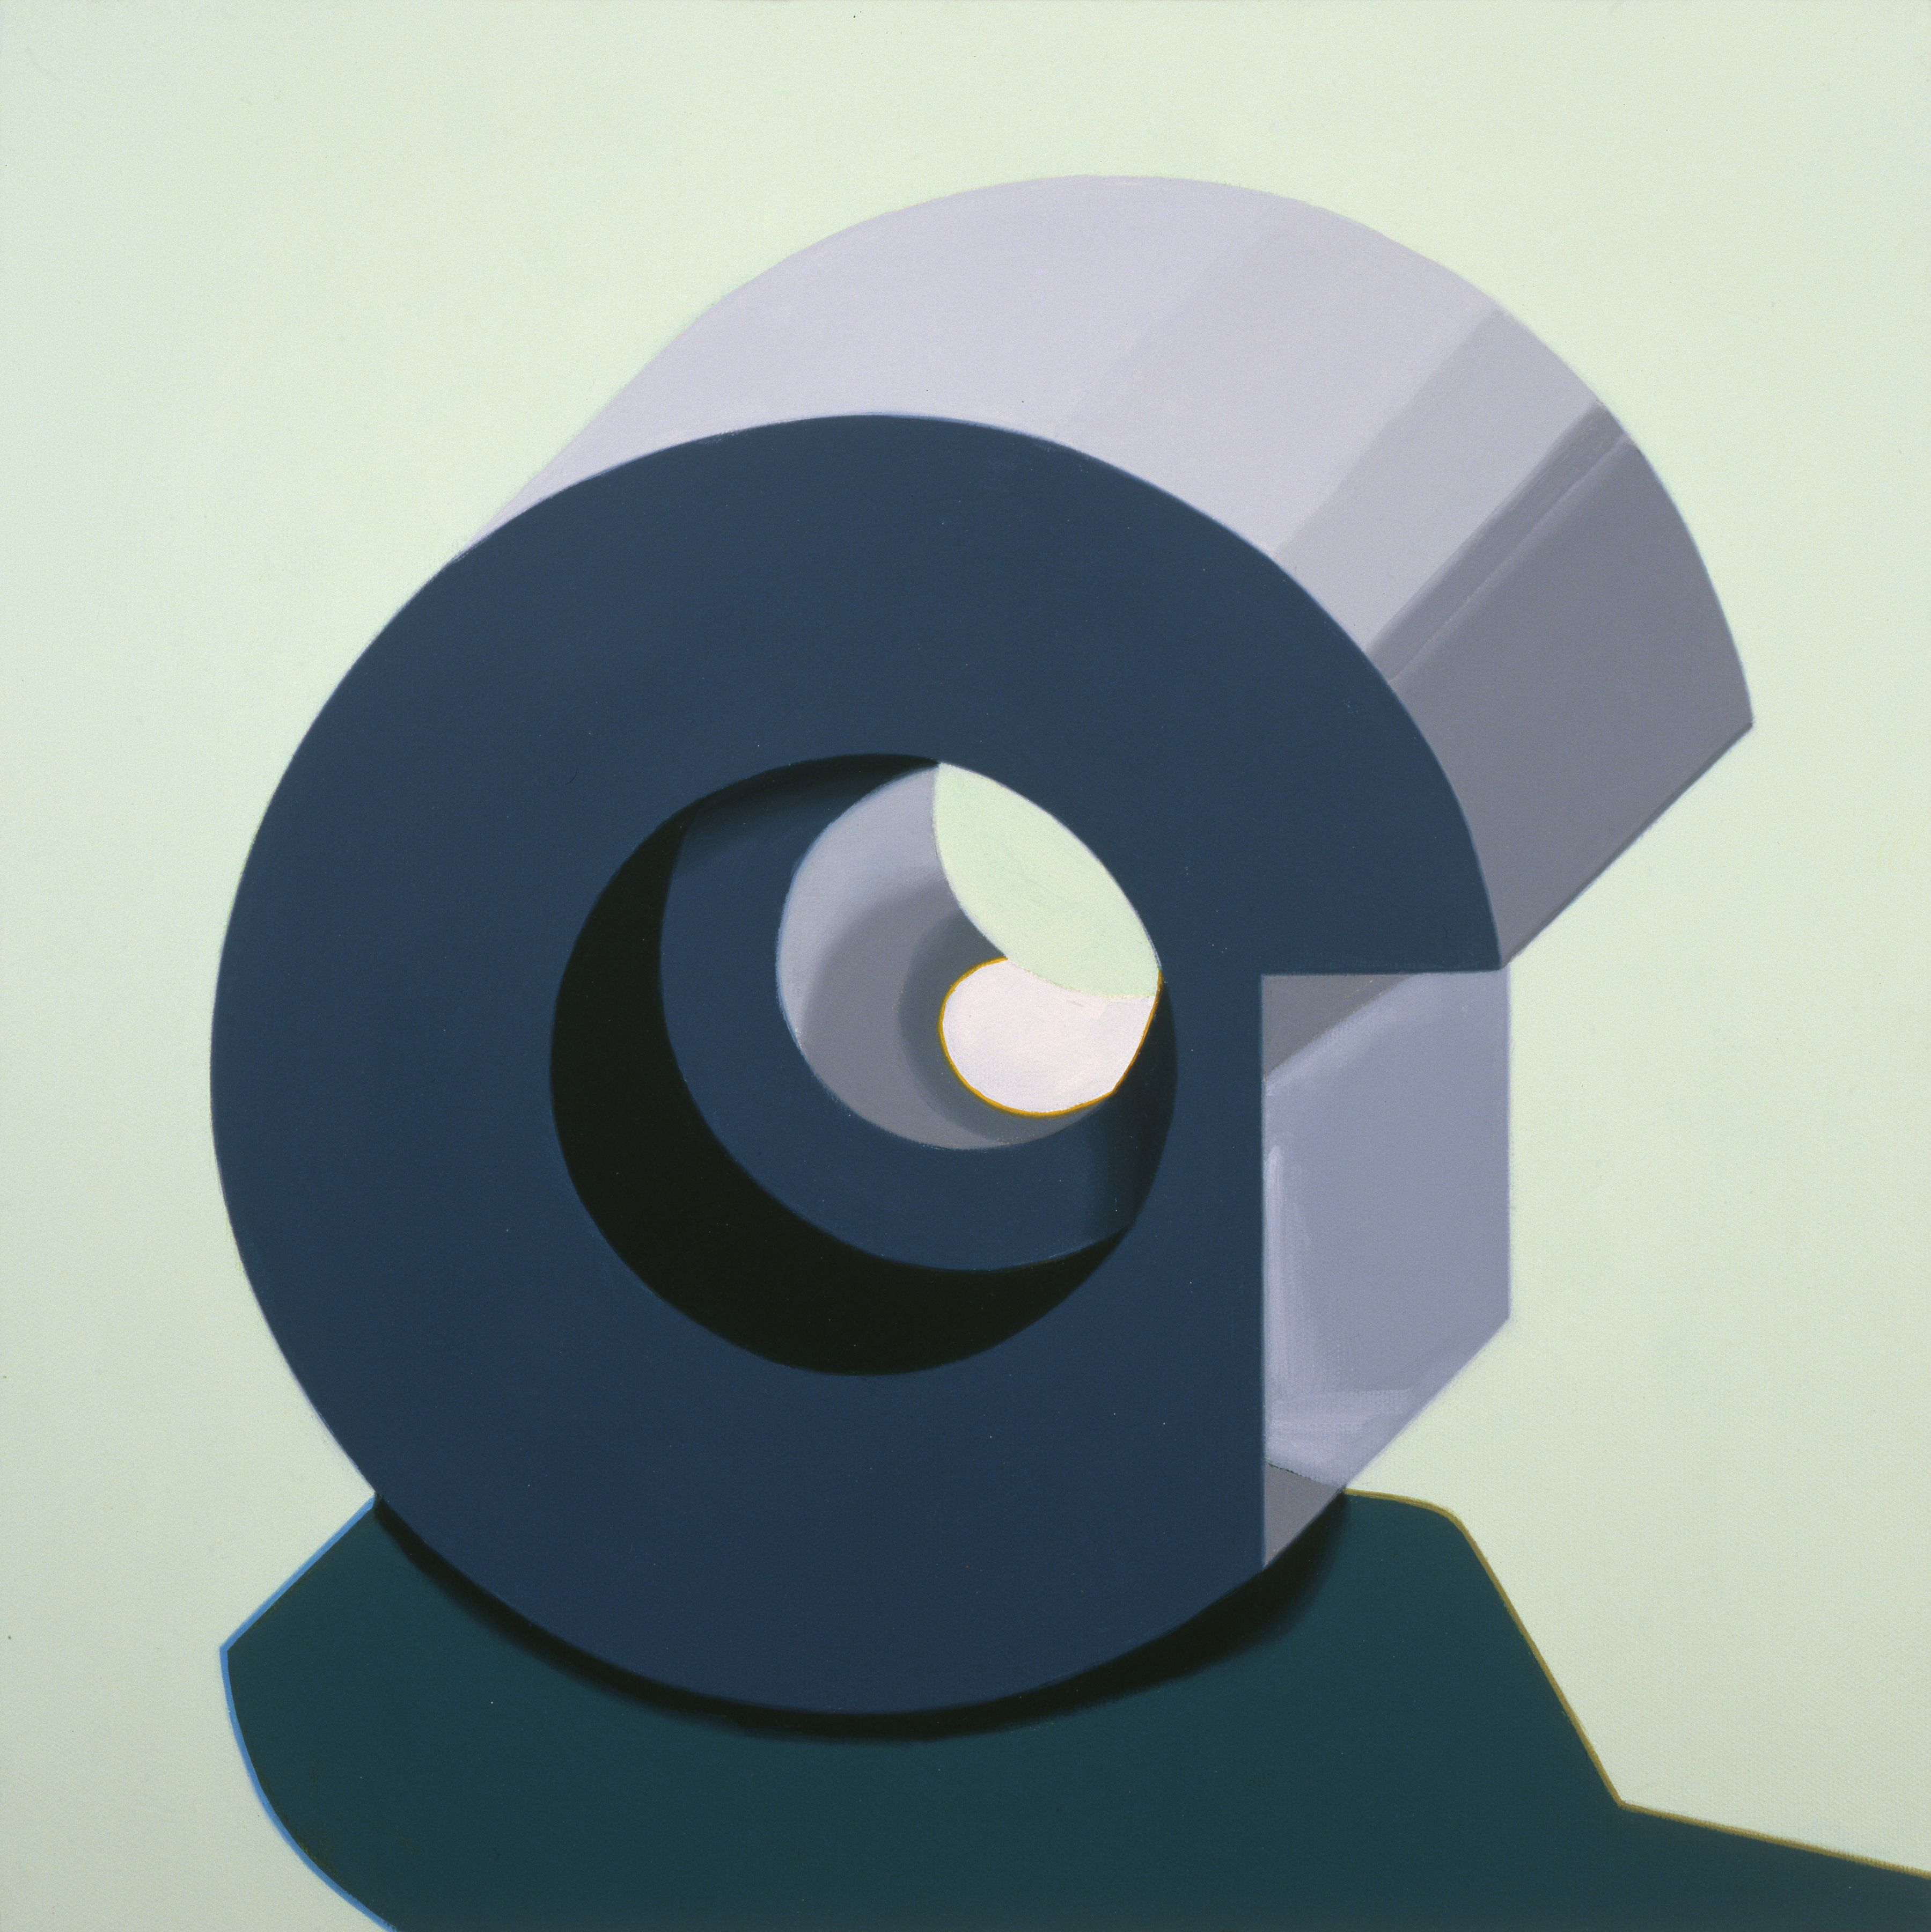 Robert Cottingham, Component IXXX, 2005, gouache on paper, 5 1/2 x 5 1/2 inches